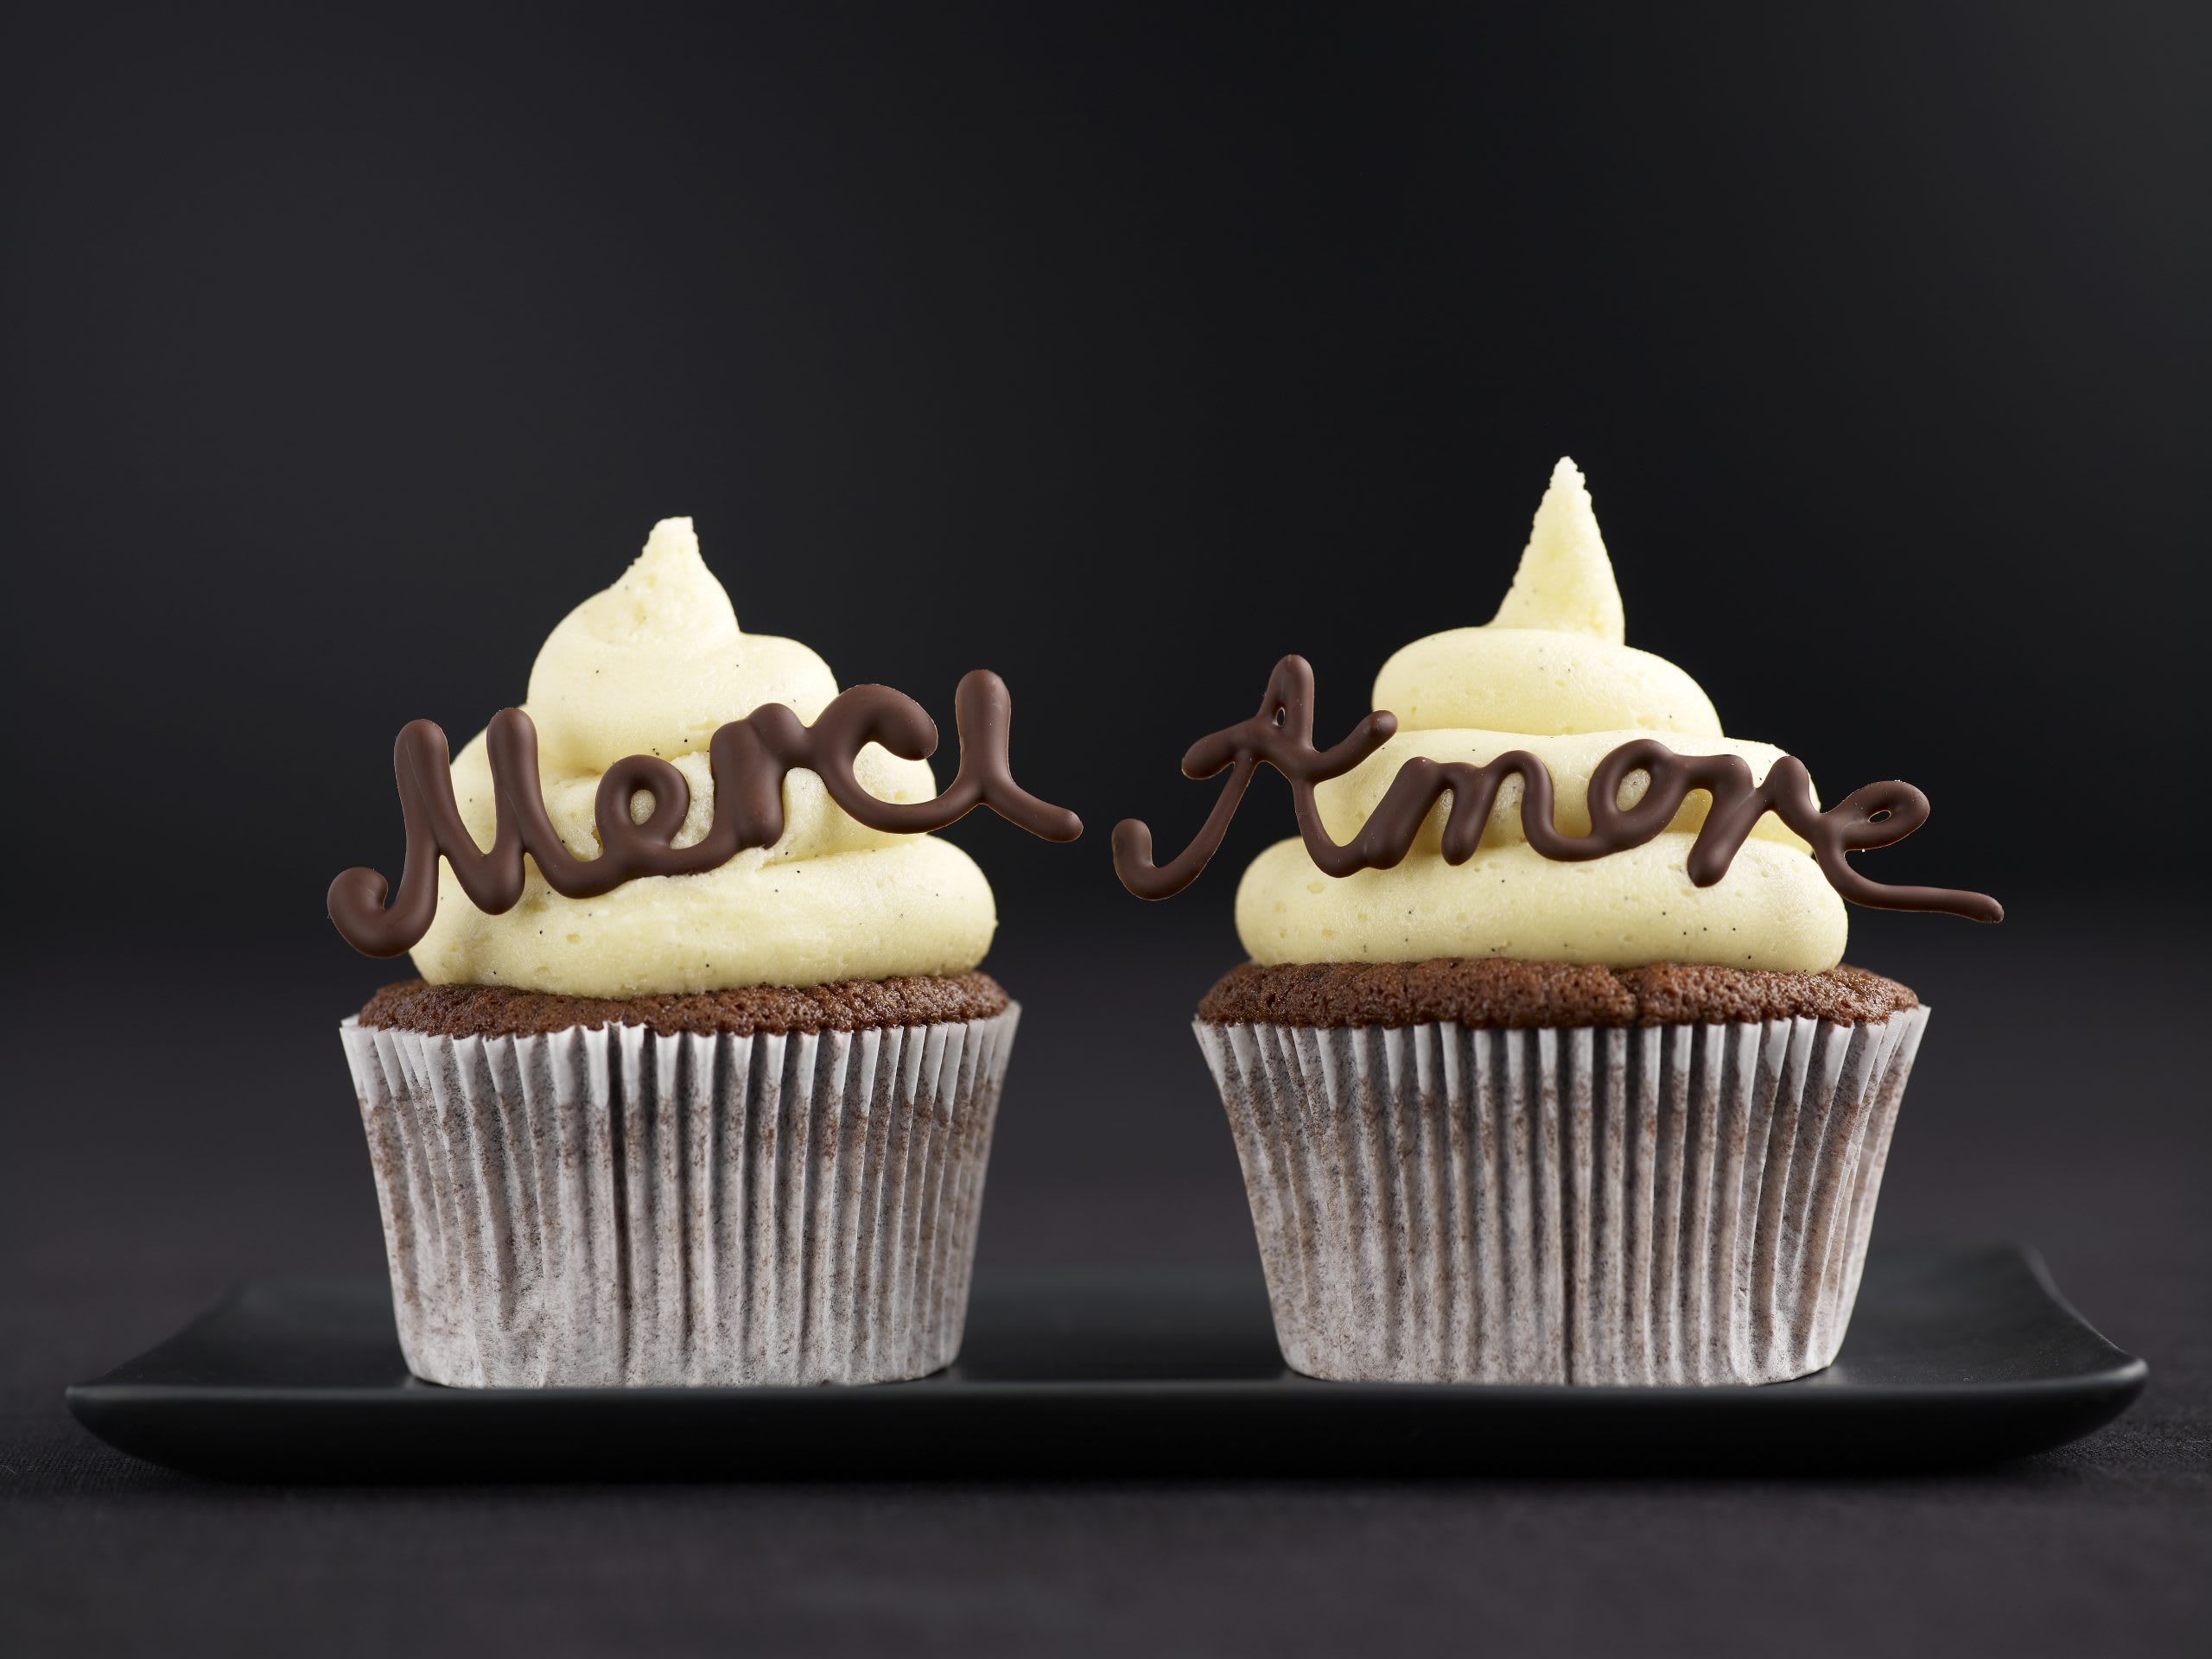 Cupcakes Merci & Amore